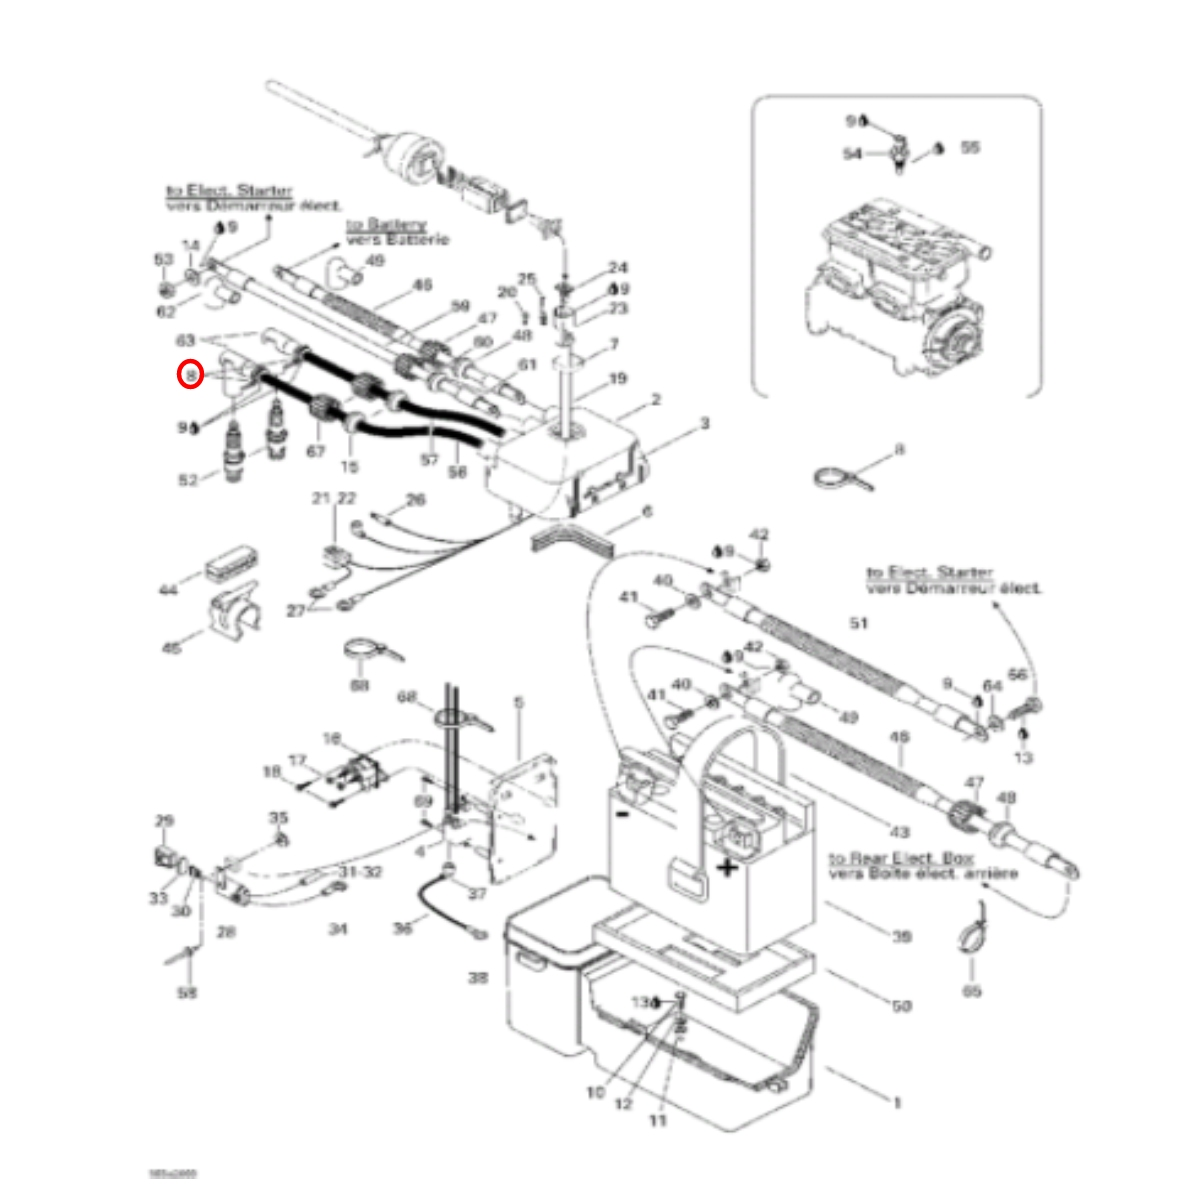 Cachimbo de vela  para Jet Ski Sea Doo, Yamaha, Kawasaki NGK   - Radical Peças - Peças para Jet Ski